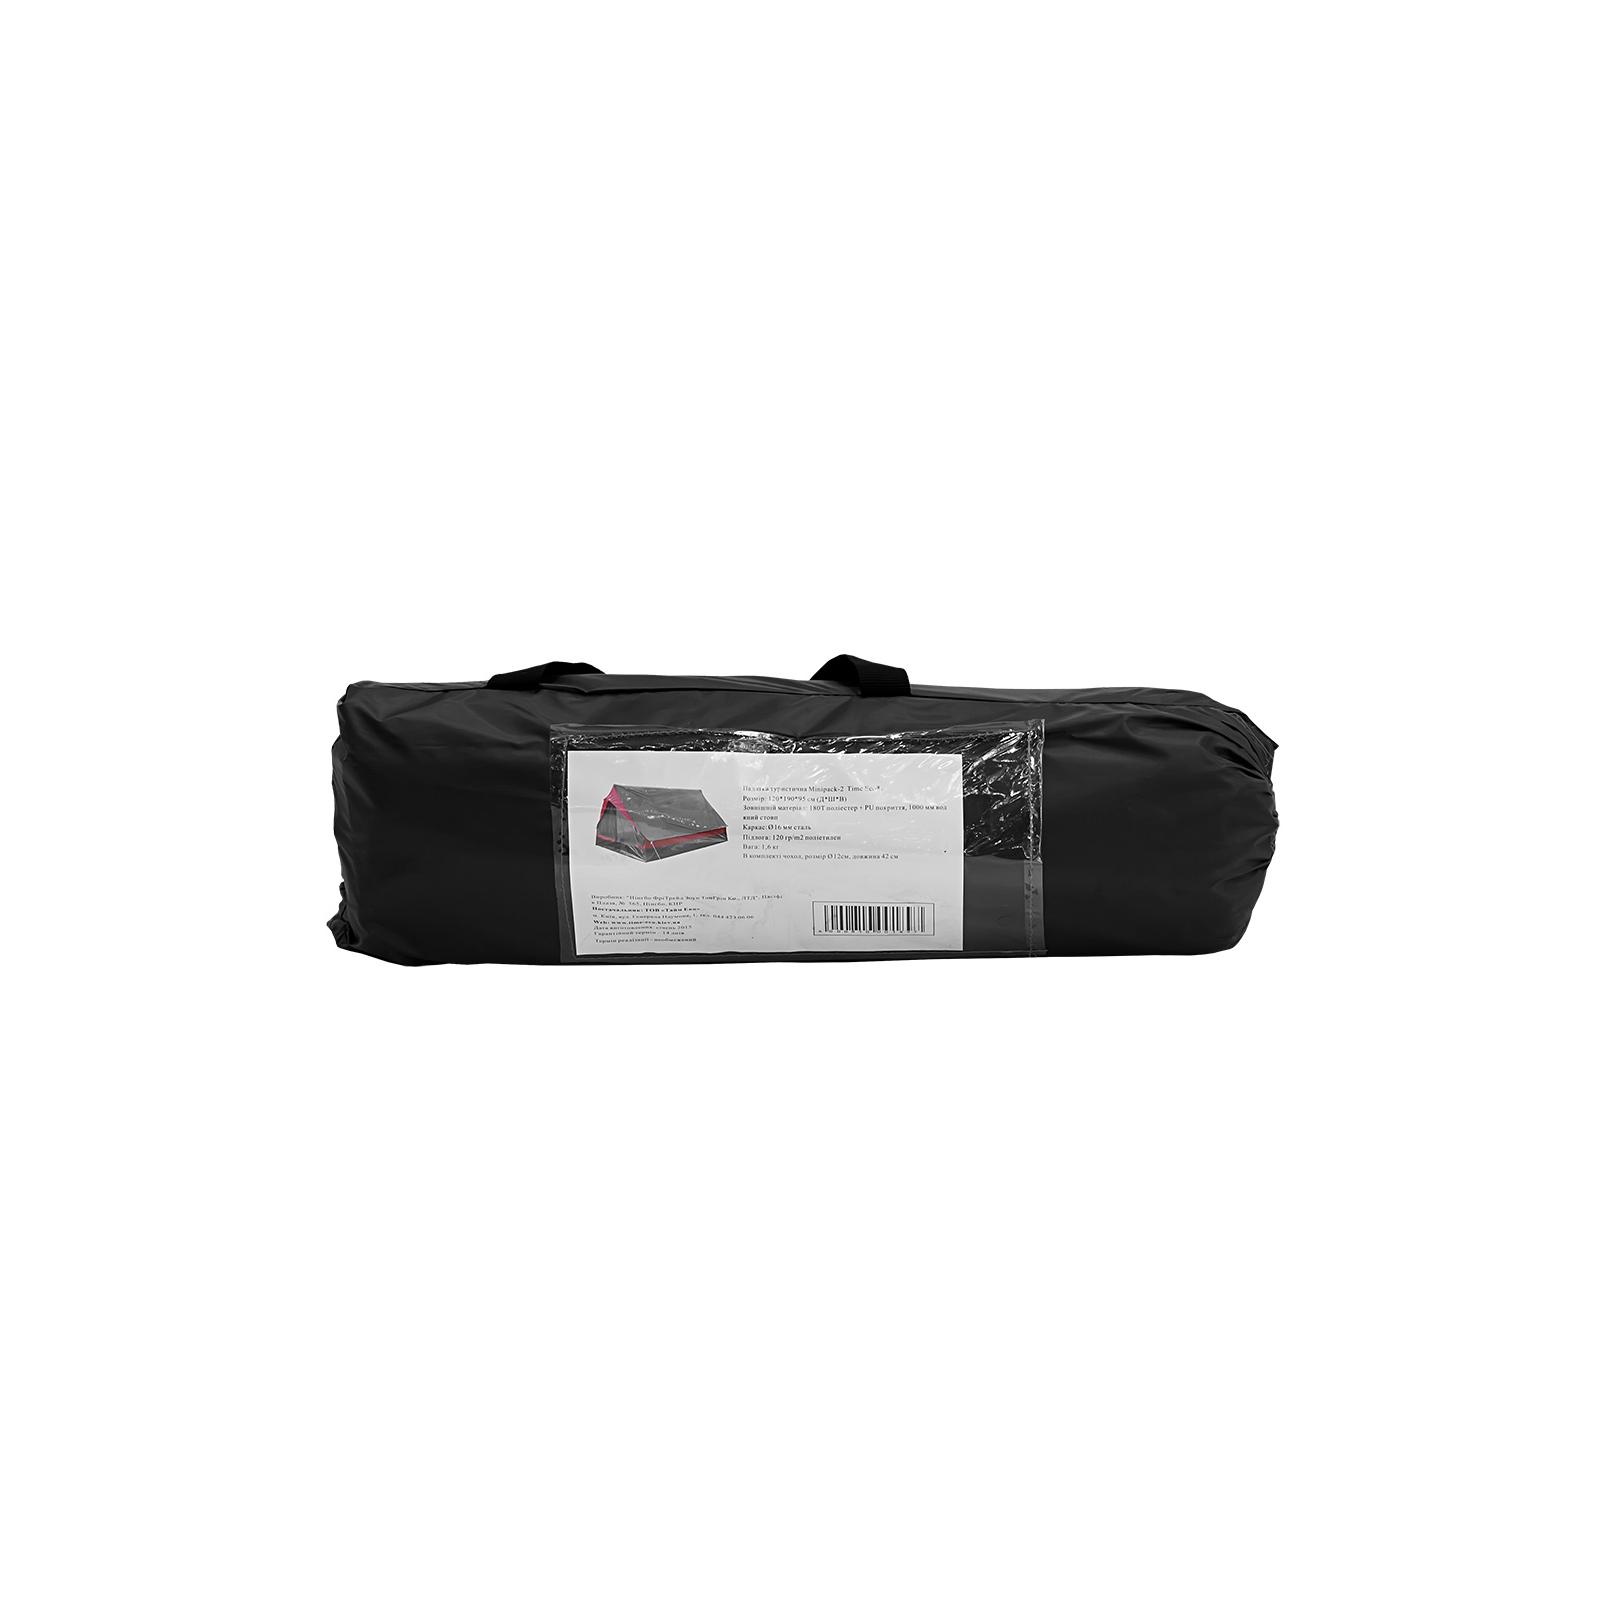 Палатка Time Eco Minipack-2 изображение 4